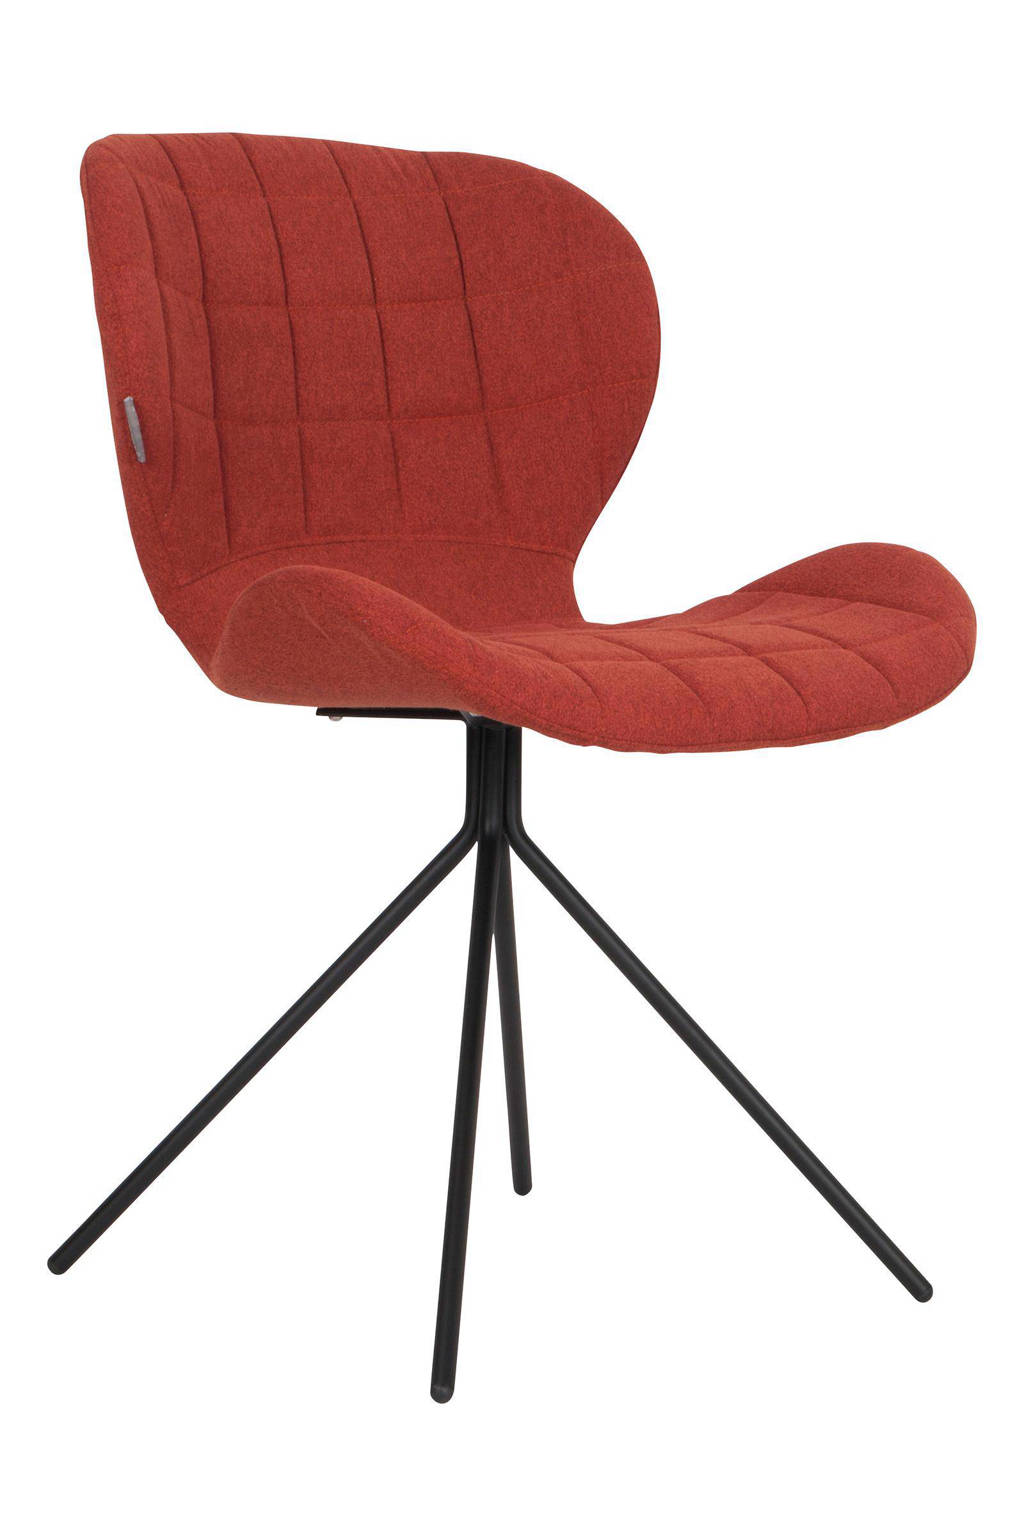 Zuiver OMG eetkamerstoel (set van 2), Oranje, polyester/multiplex/staal